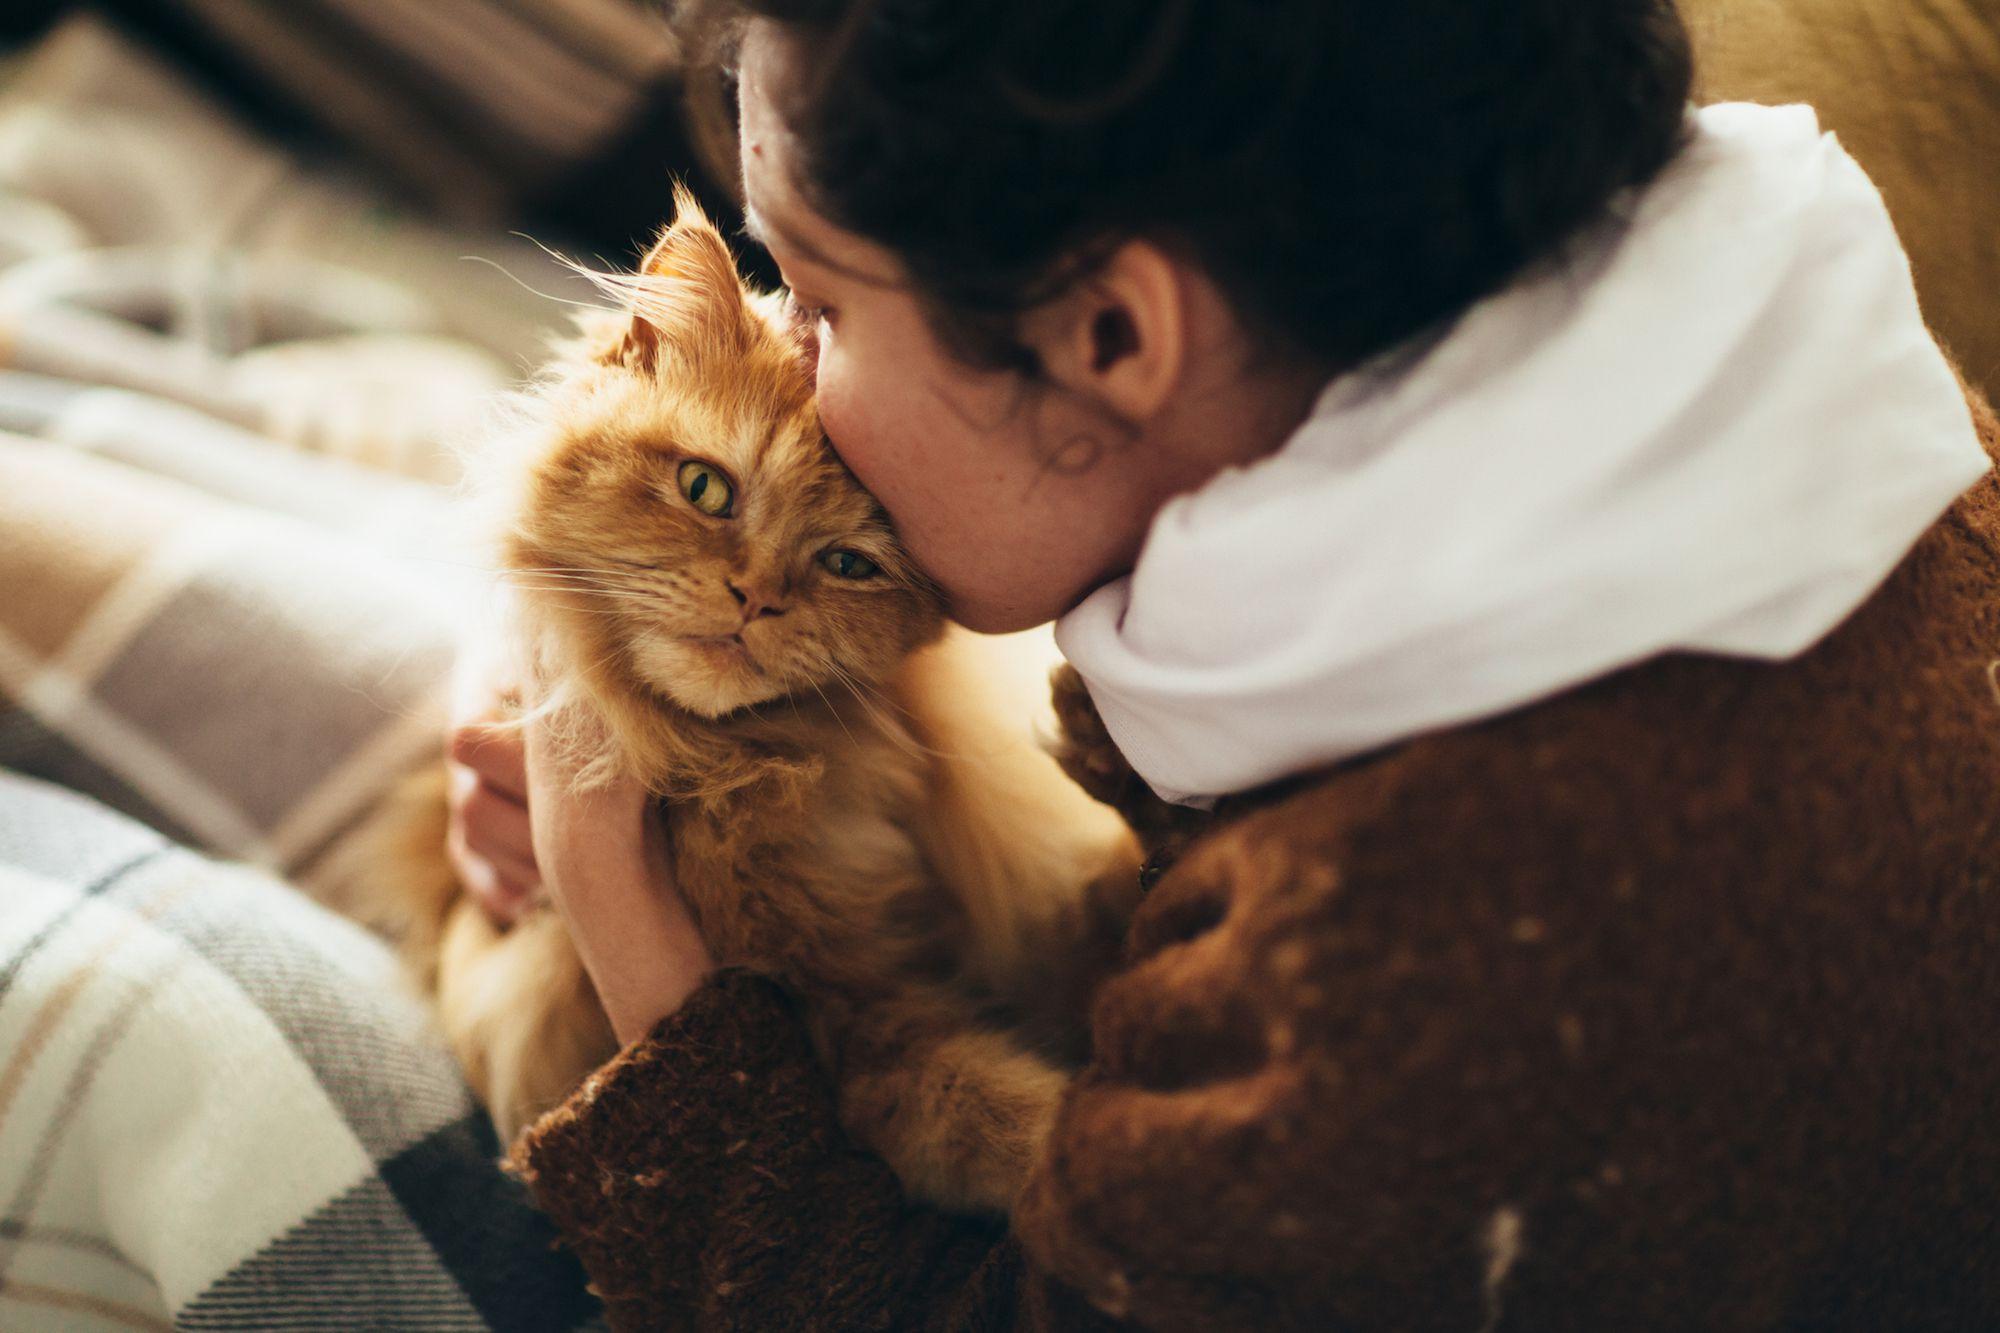 Apa Nama Jerman Dapatkah Anda Berikan Anjing Anda Atau Cat